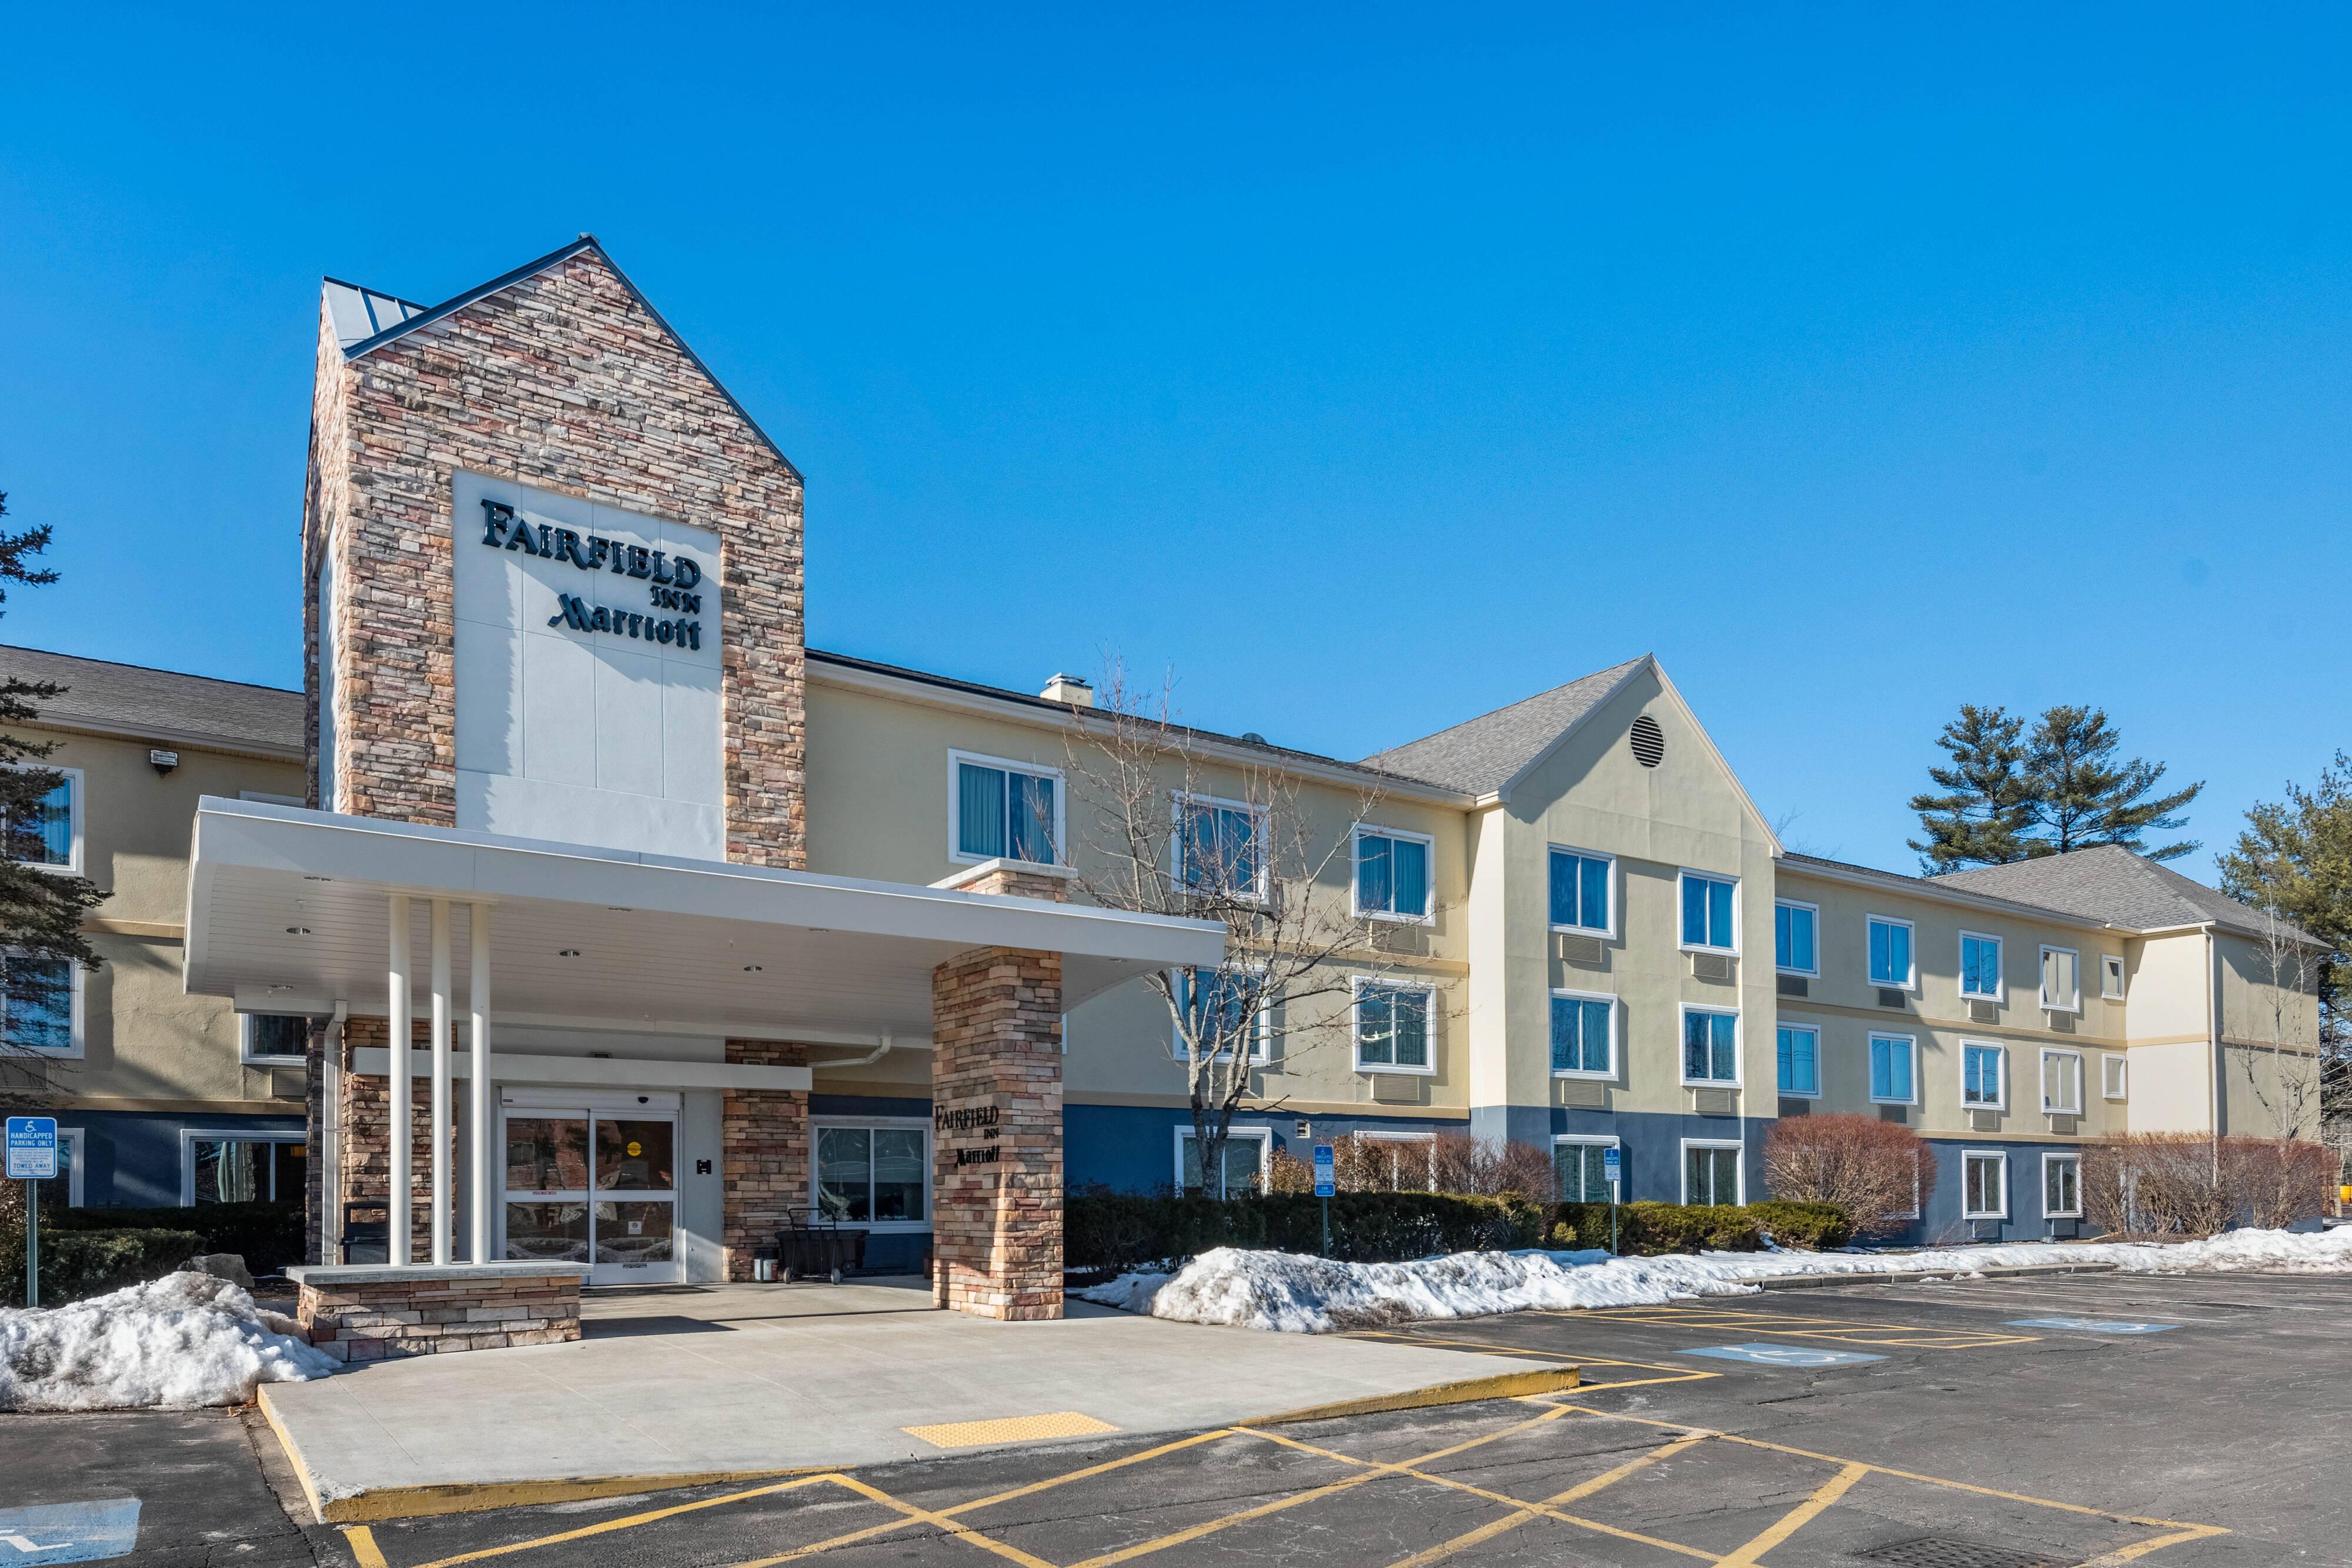 Fairfield Inn Mn Mall Marriott